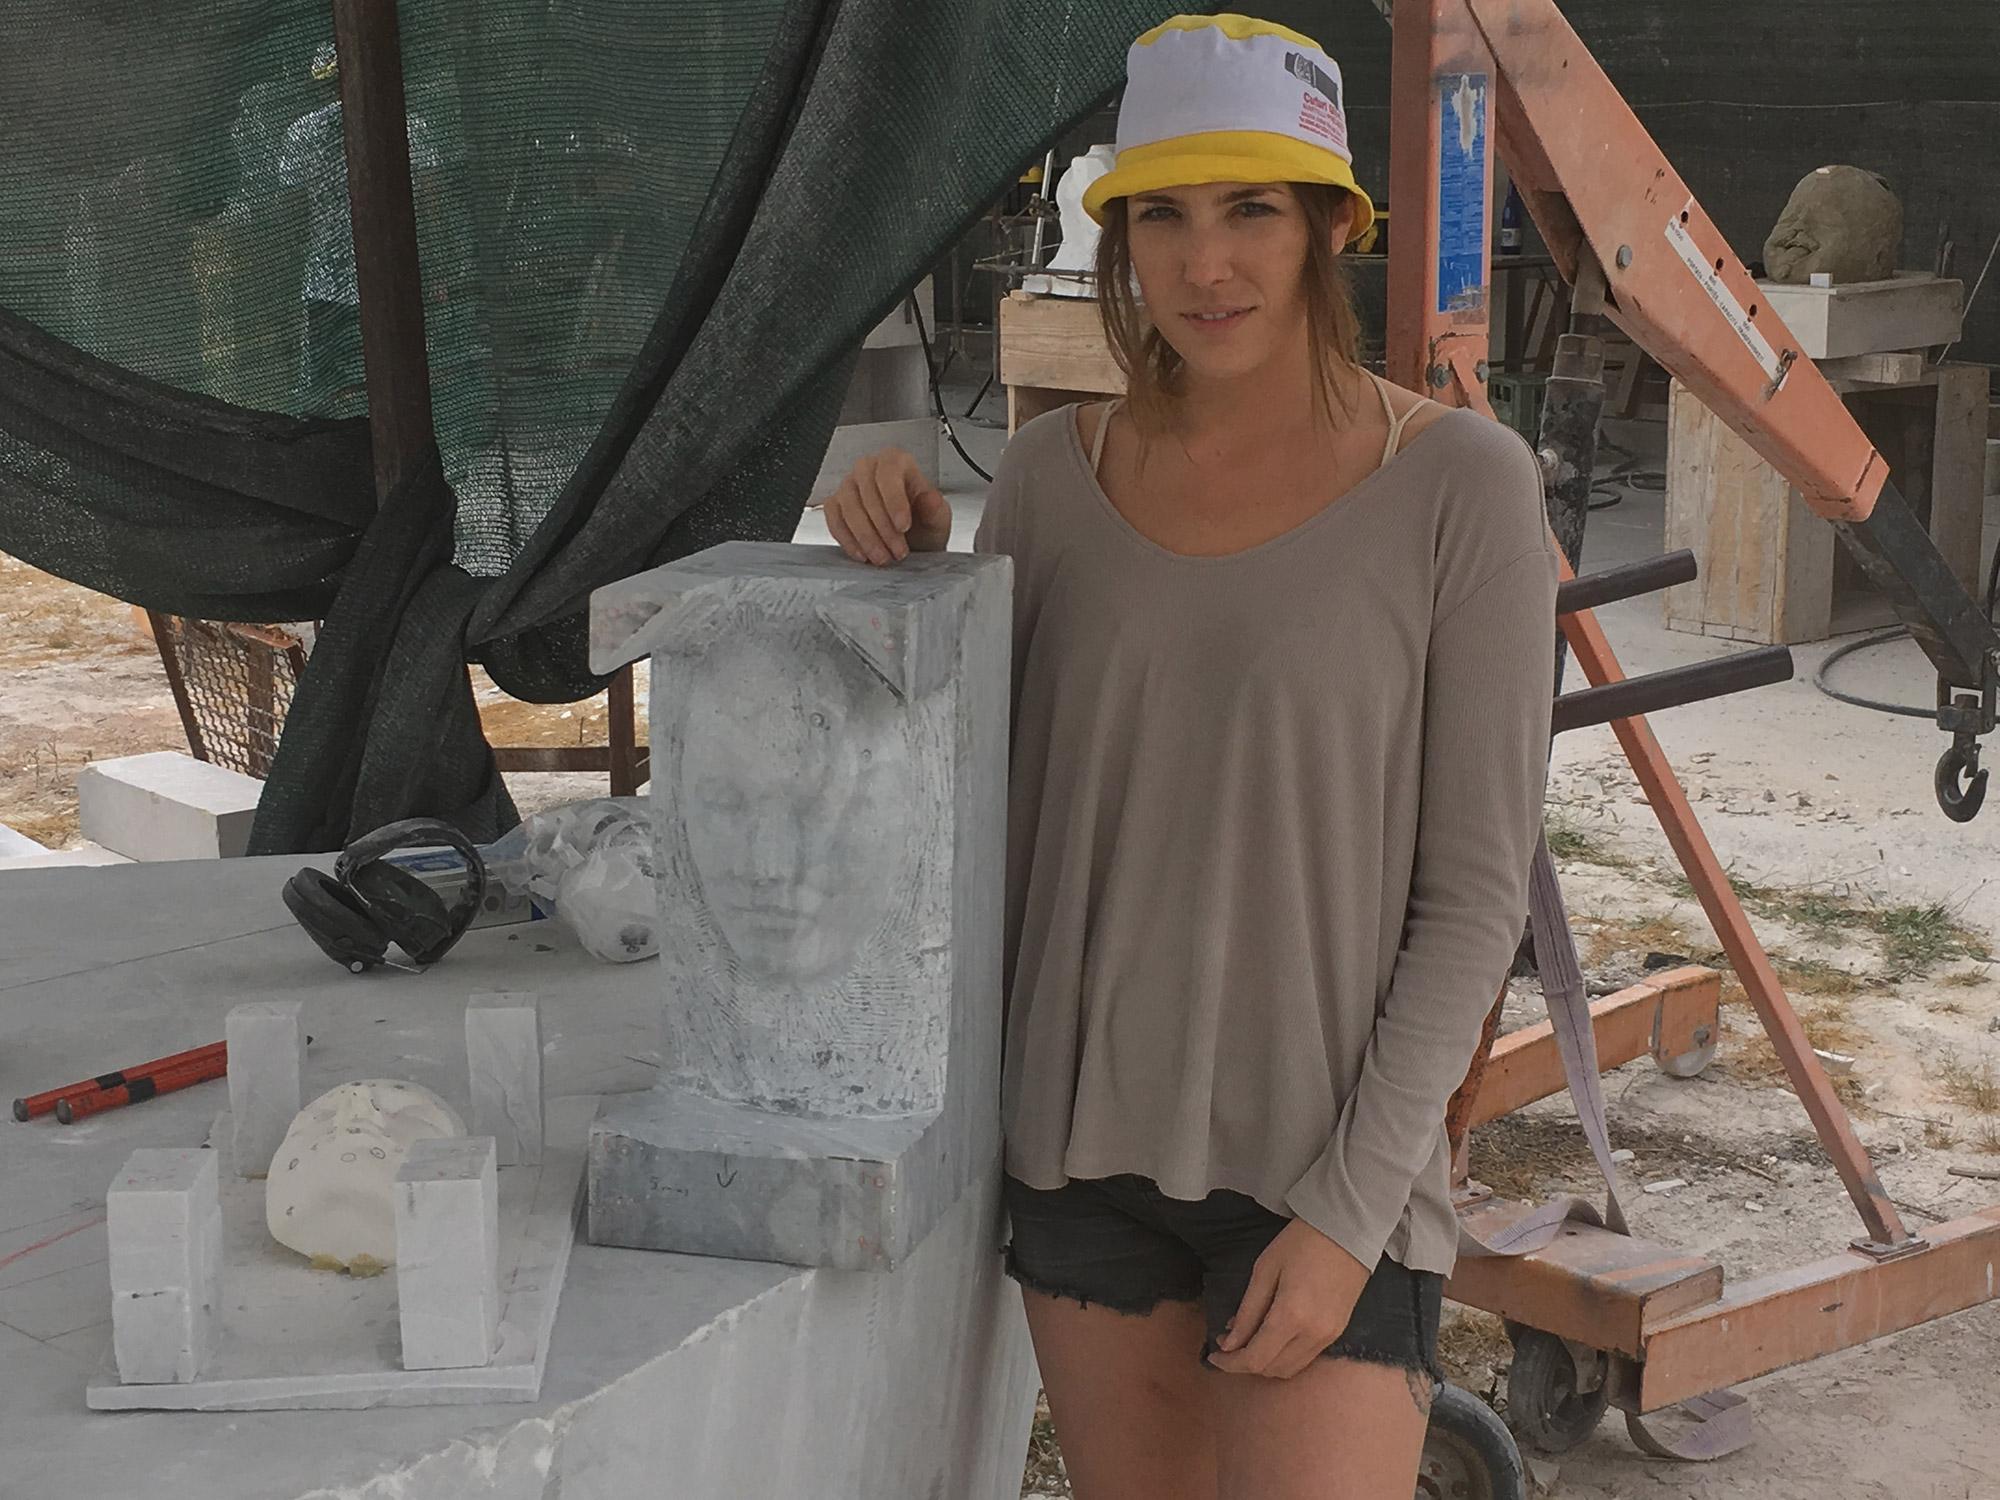 Mary-Beth-Gutkowski-Sculpture-Residency-Amelia-Kate-Sampson-and-Elizabeth-Hardy20171213_0204.jpg